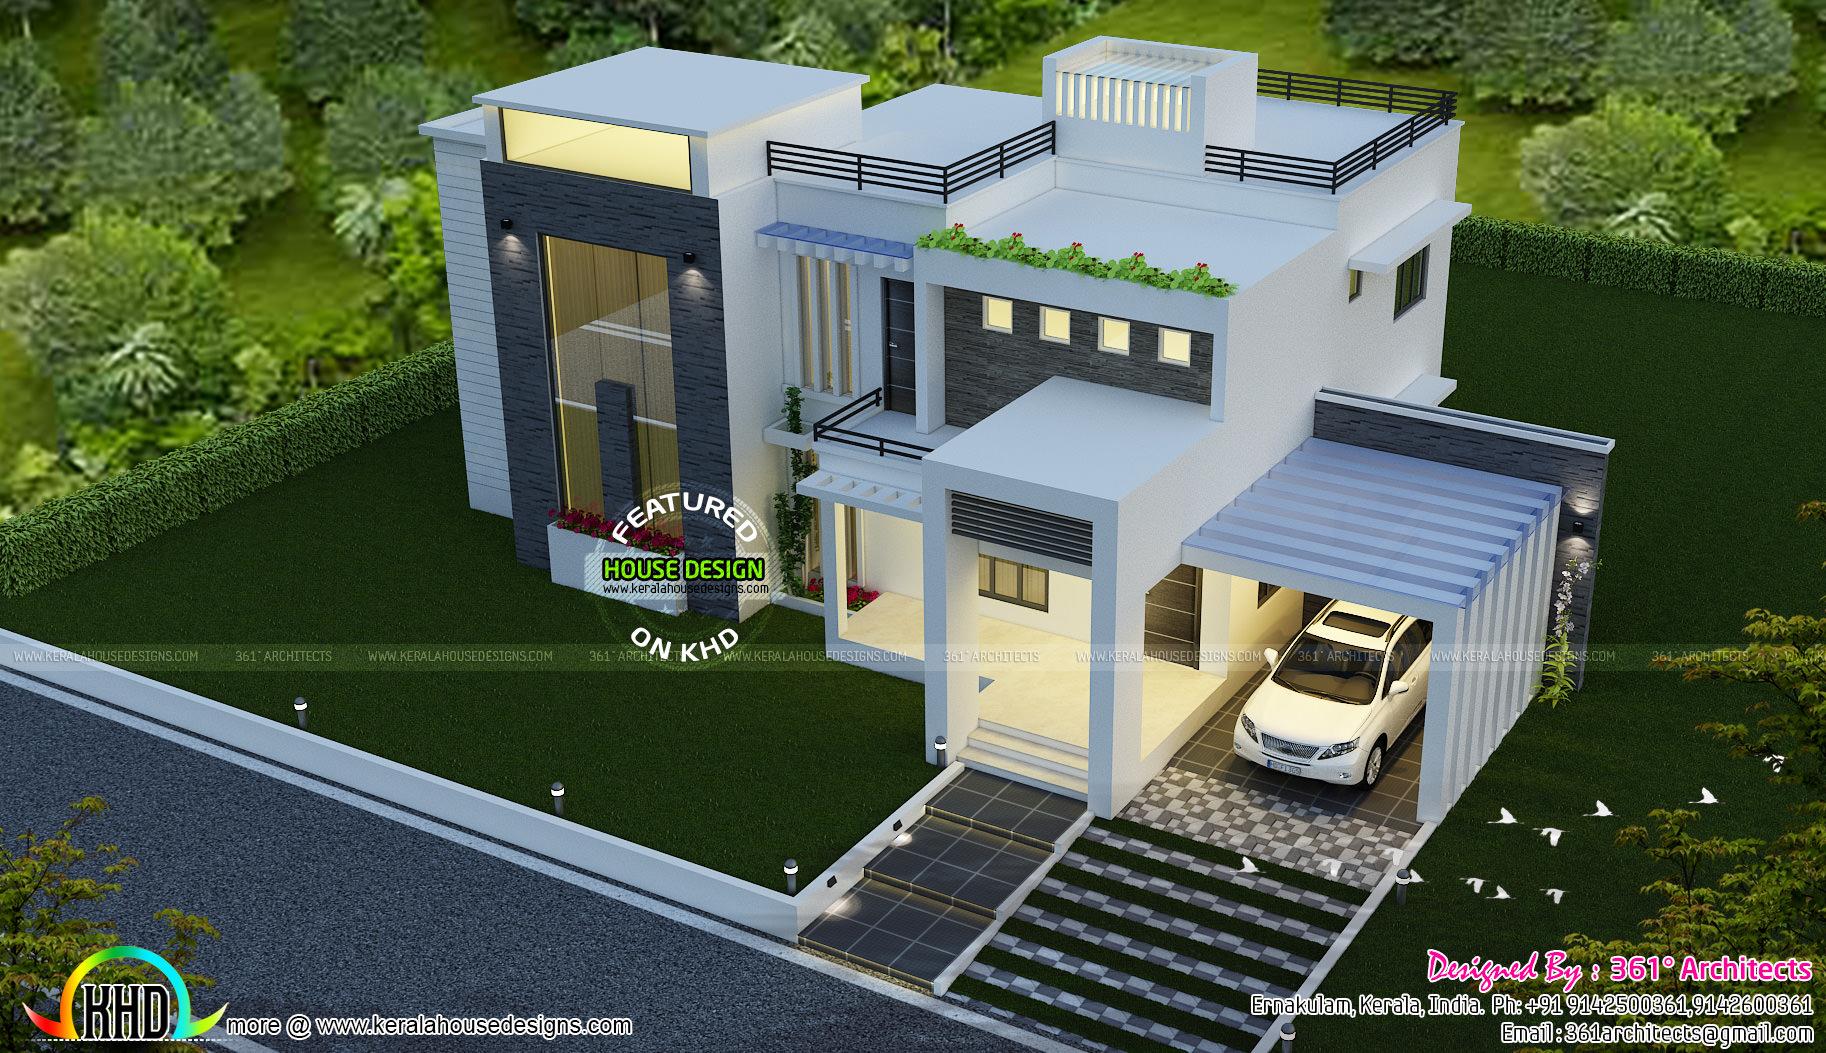 Superb contemporary home 2780 sq ft kerala home design and floor plans - Square meter garden design ideas ...